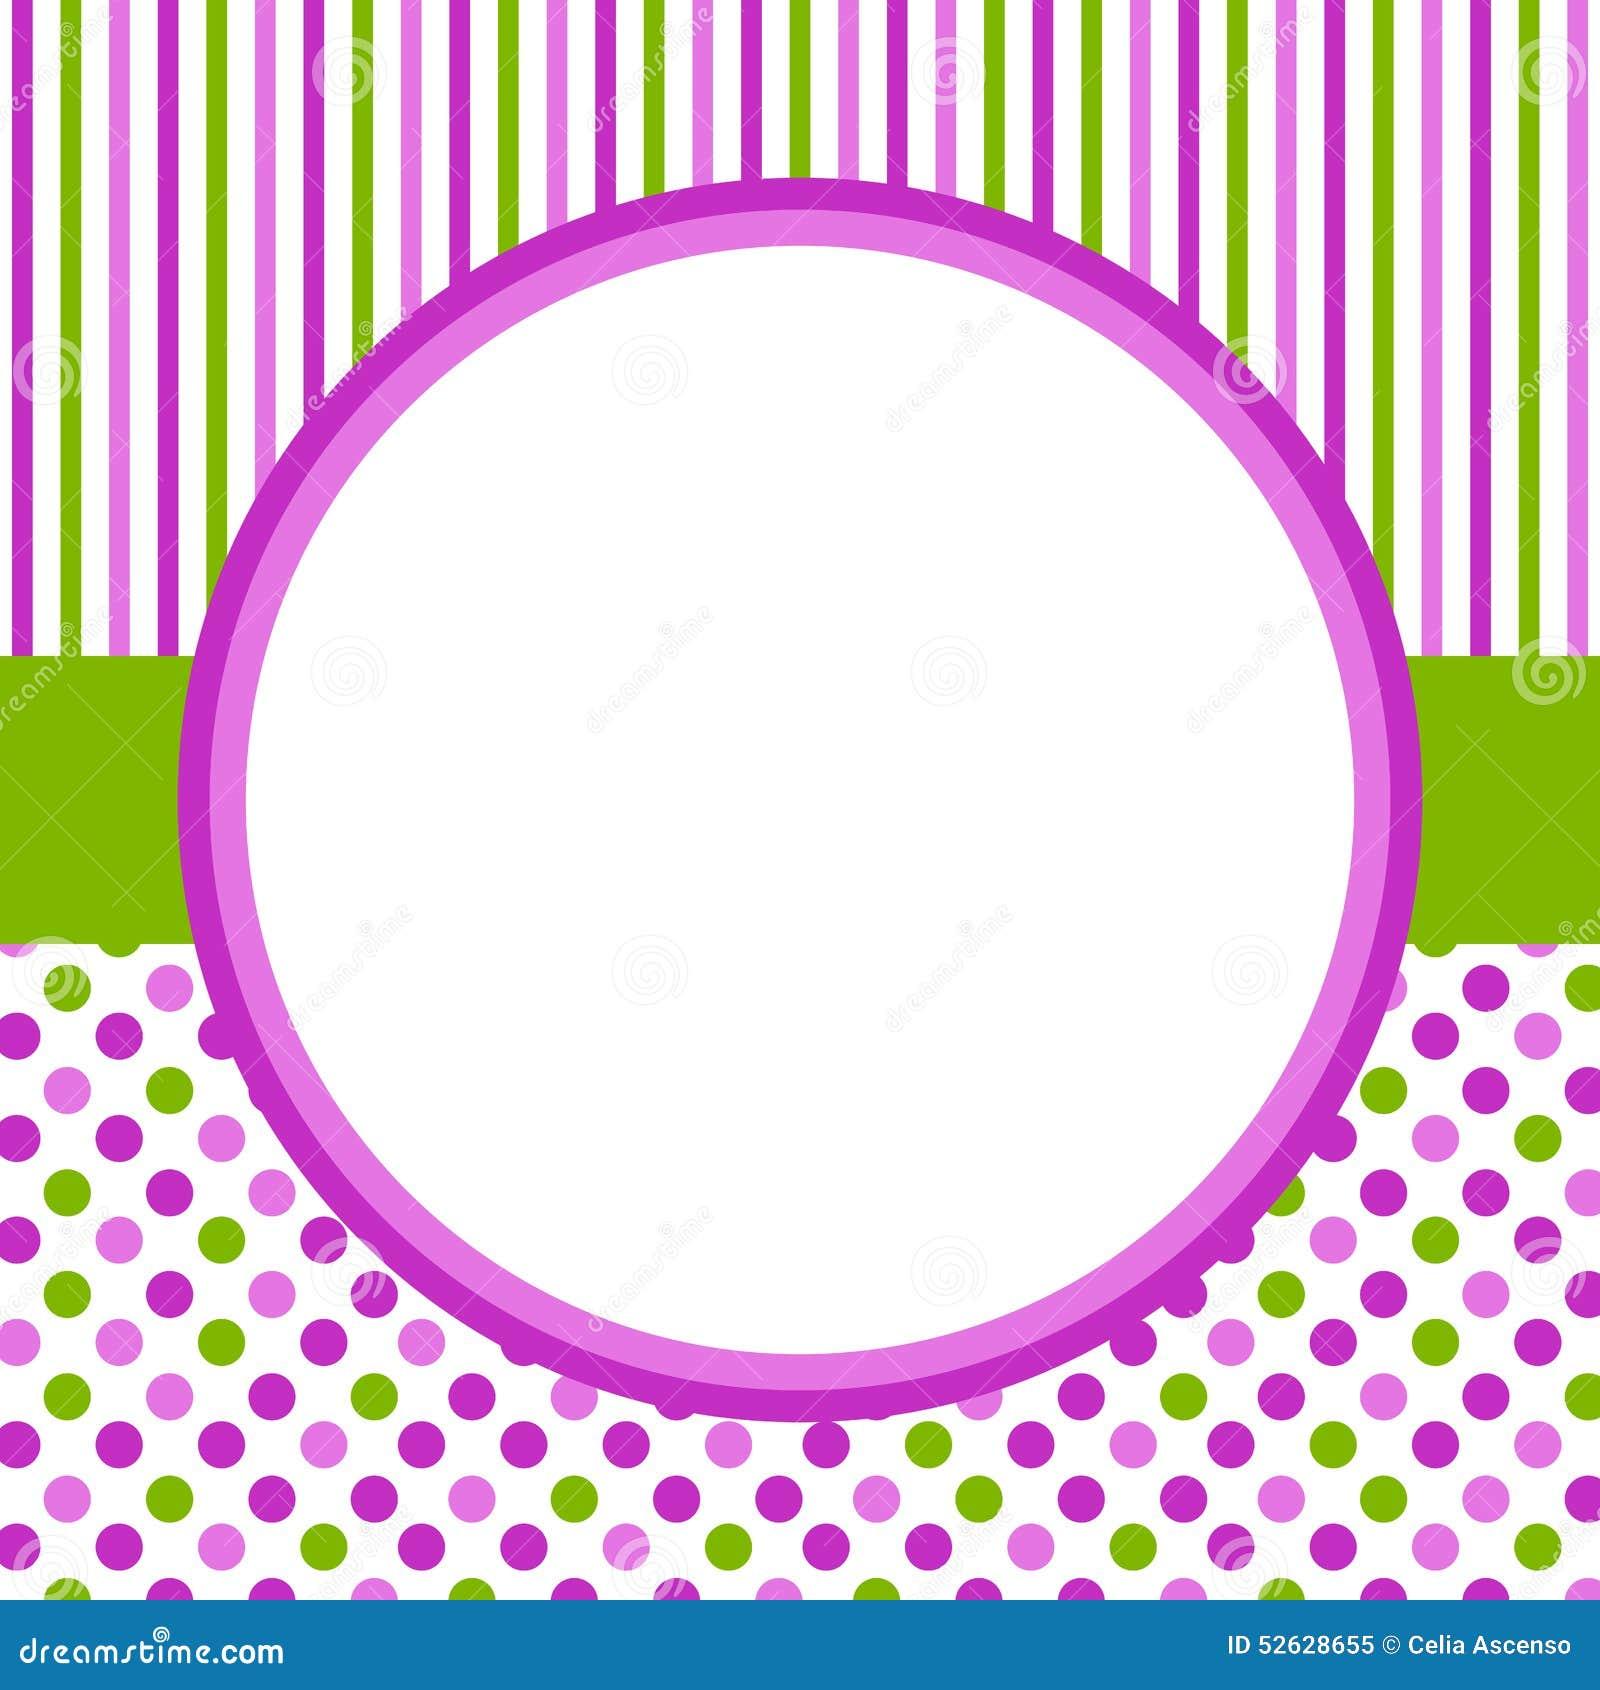 polka dots stripes circlular border frame circle shape background pattern 52628655